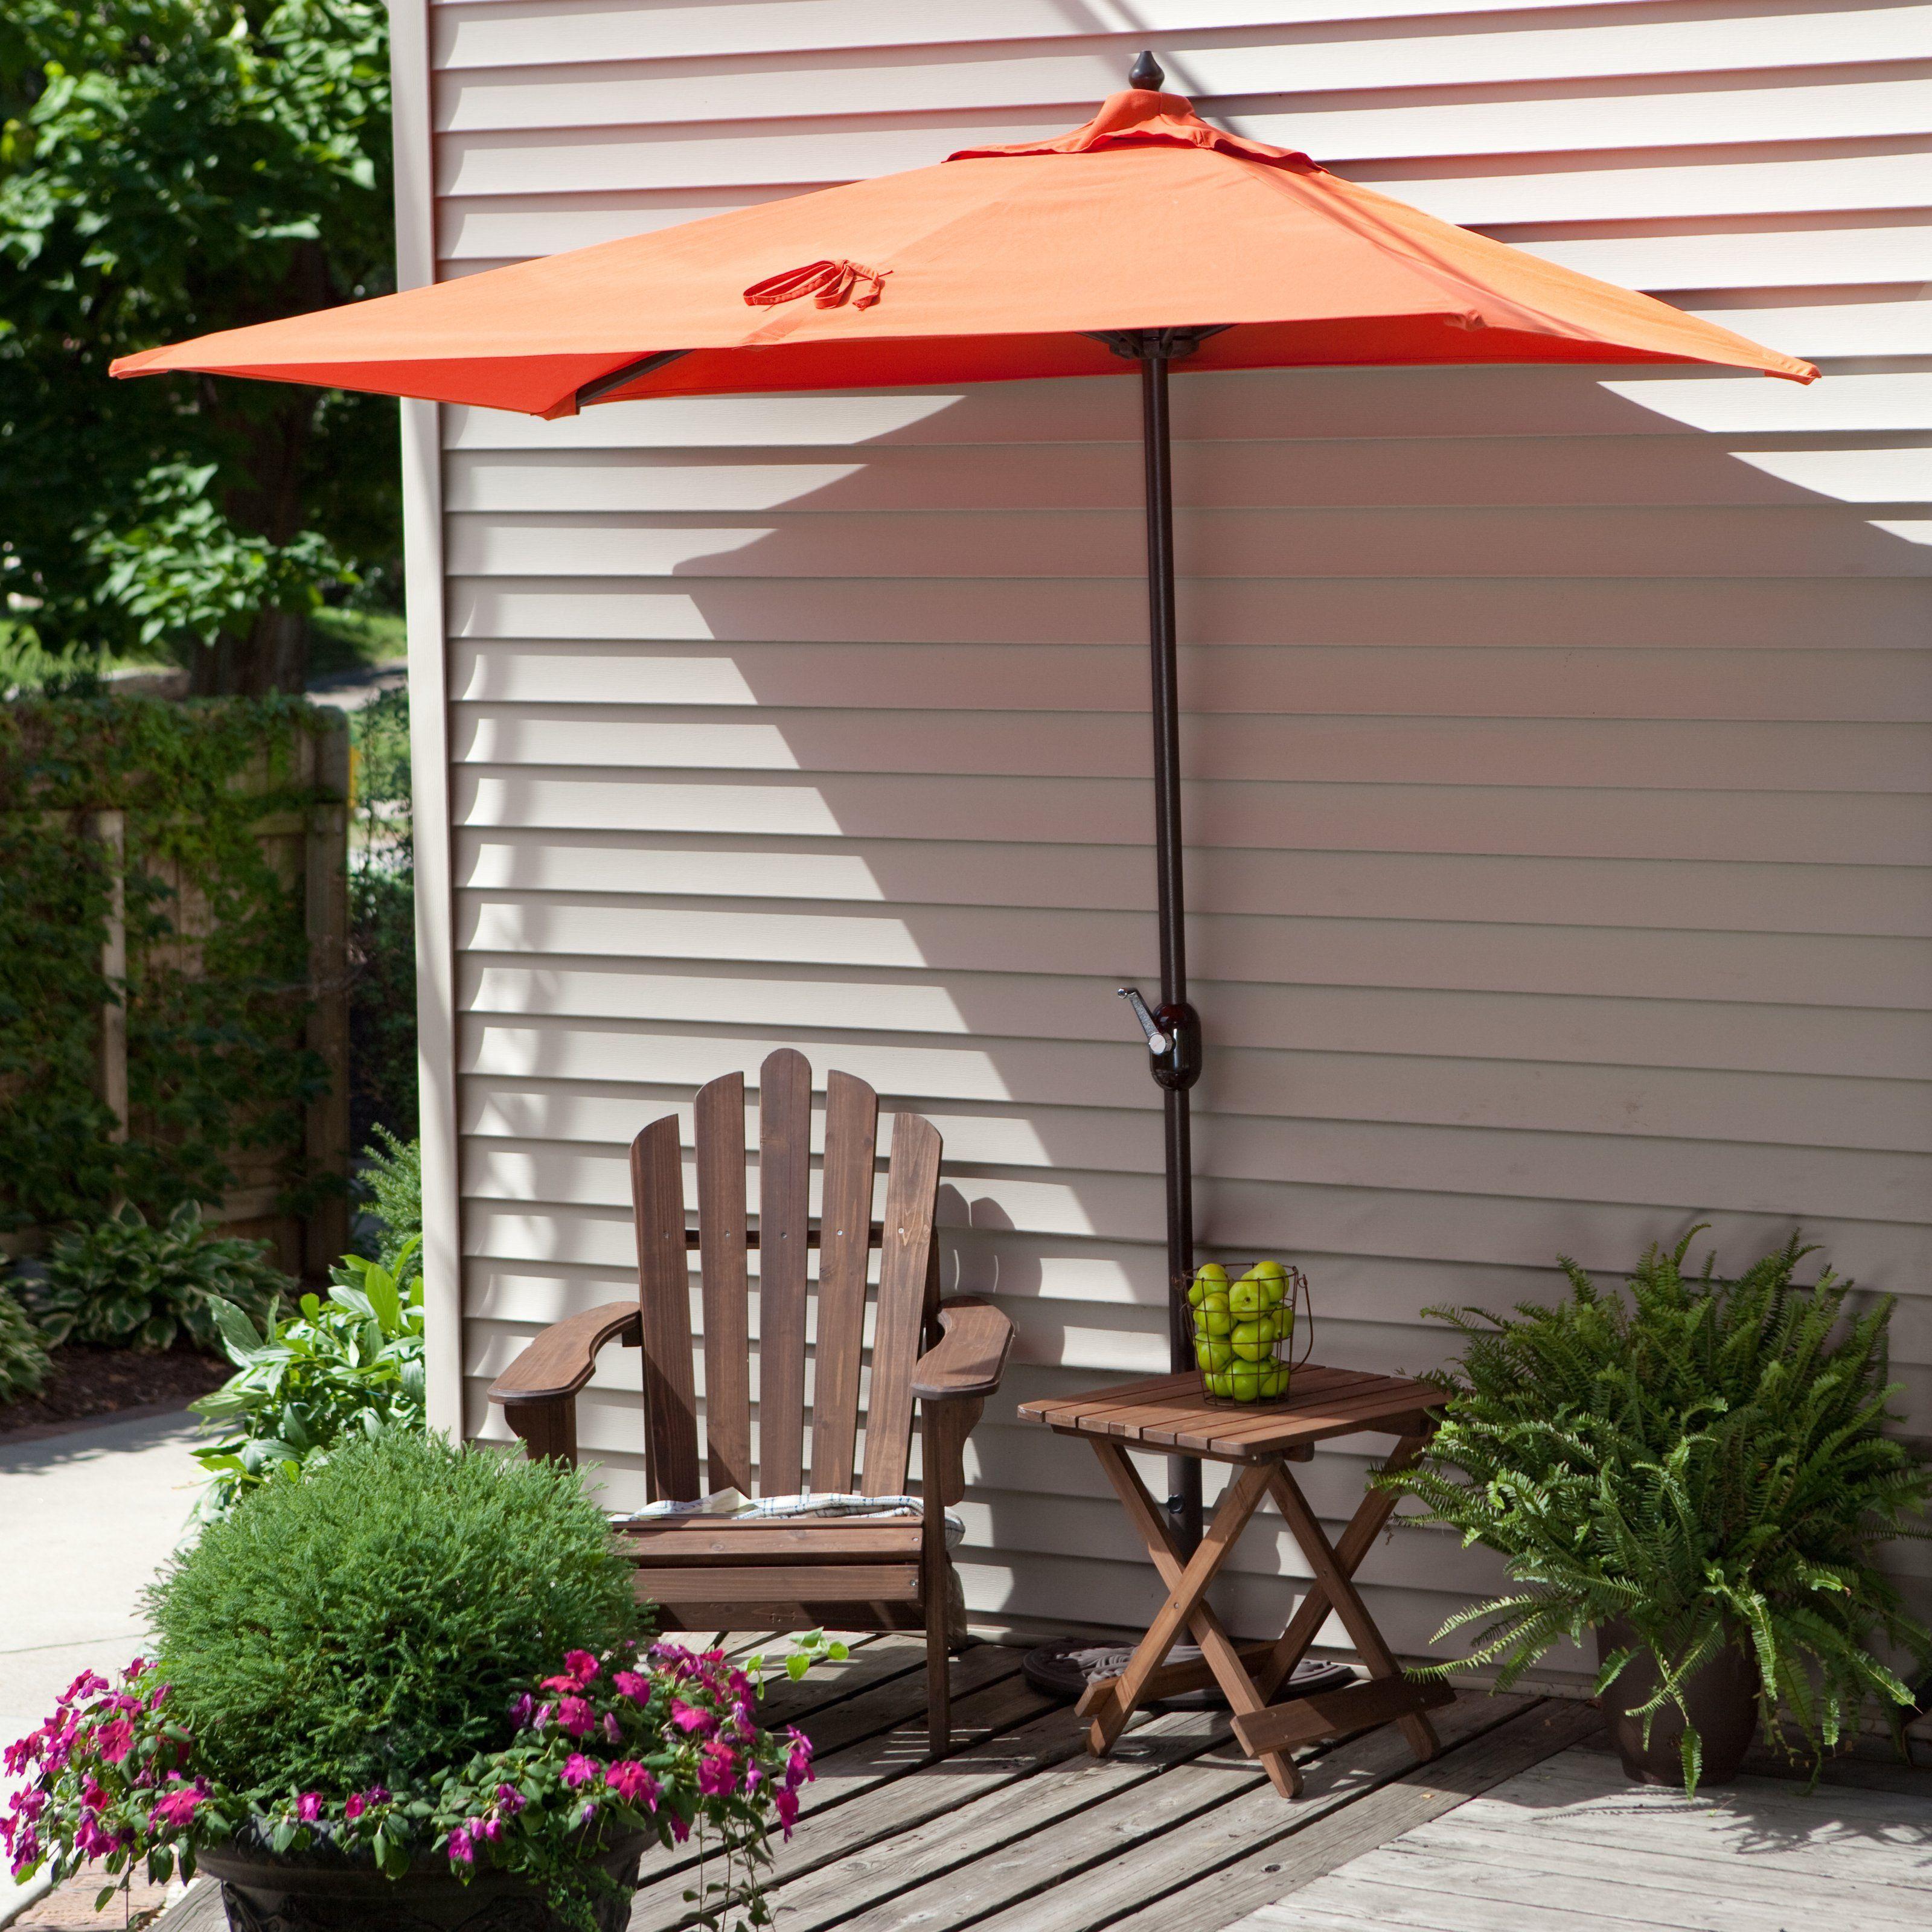 The Perfect Umbrella For Balconies Or To Shade Sliding Patio Doors Coral Coast Via Hayneedle Com Patio Umbrella Patio Rectangular Patio Umbrella